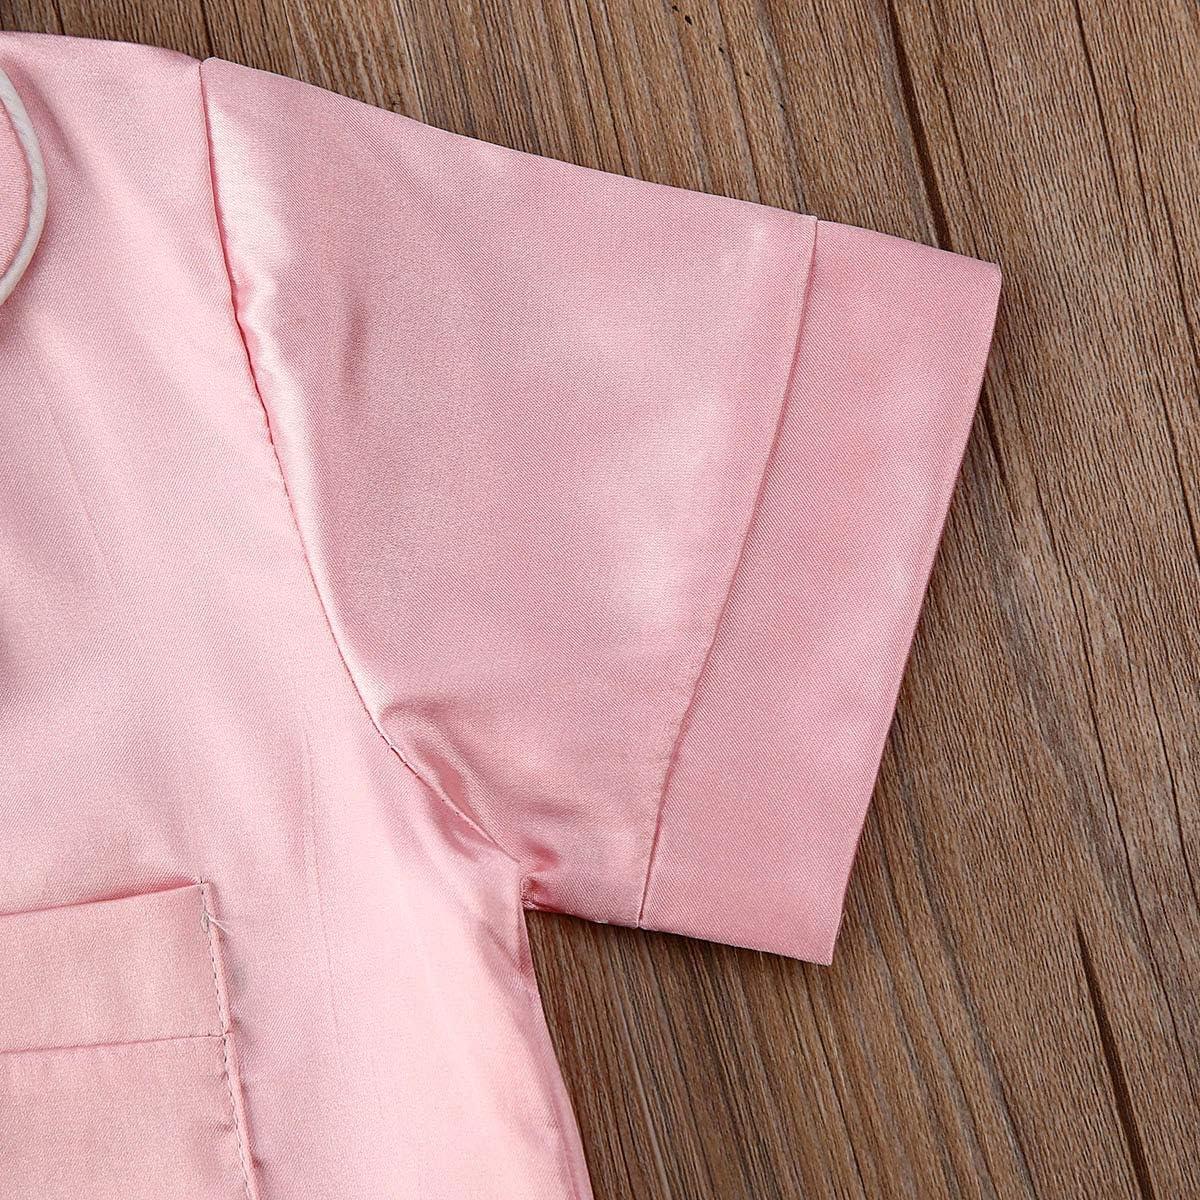 Toddler Baby Girl Boy Satin Silk Pajamas Cute Animal Cartoon Short Sleeve Pjs Sleepwear Loungewear Outfit Set